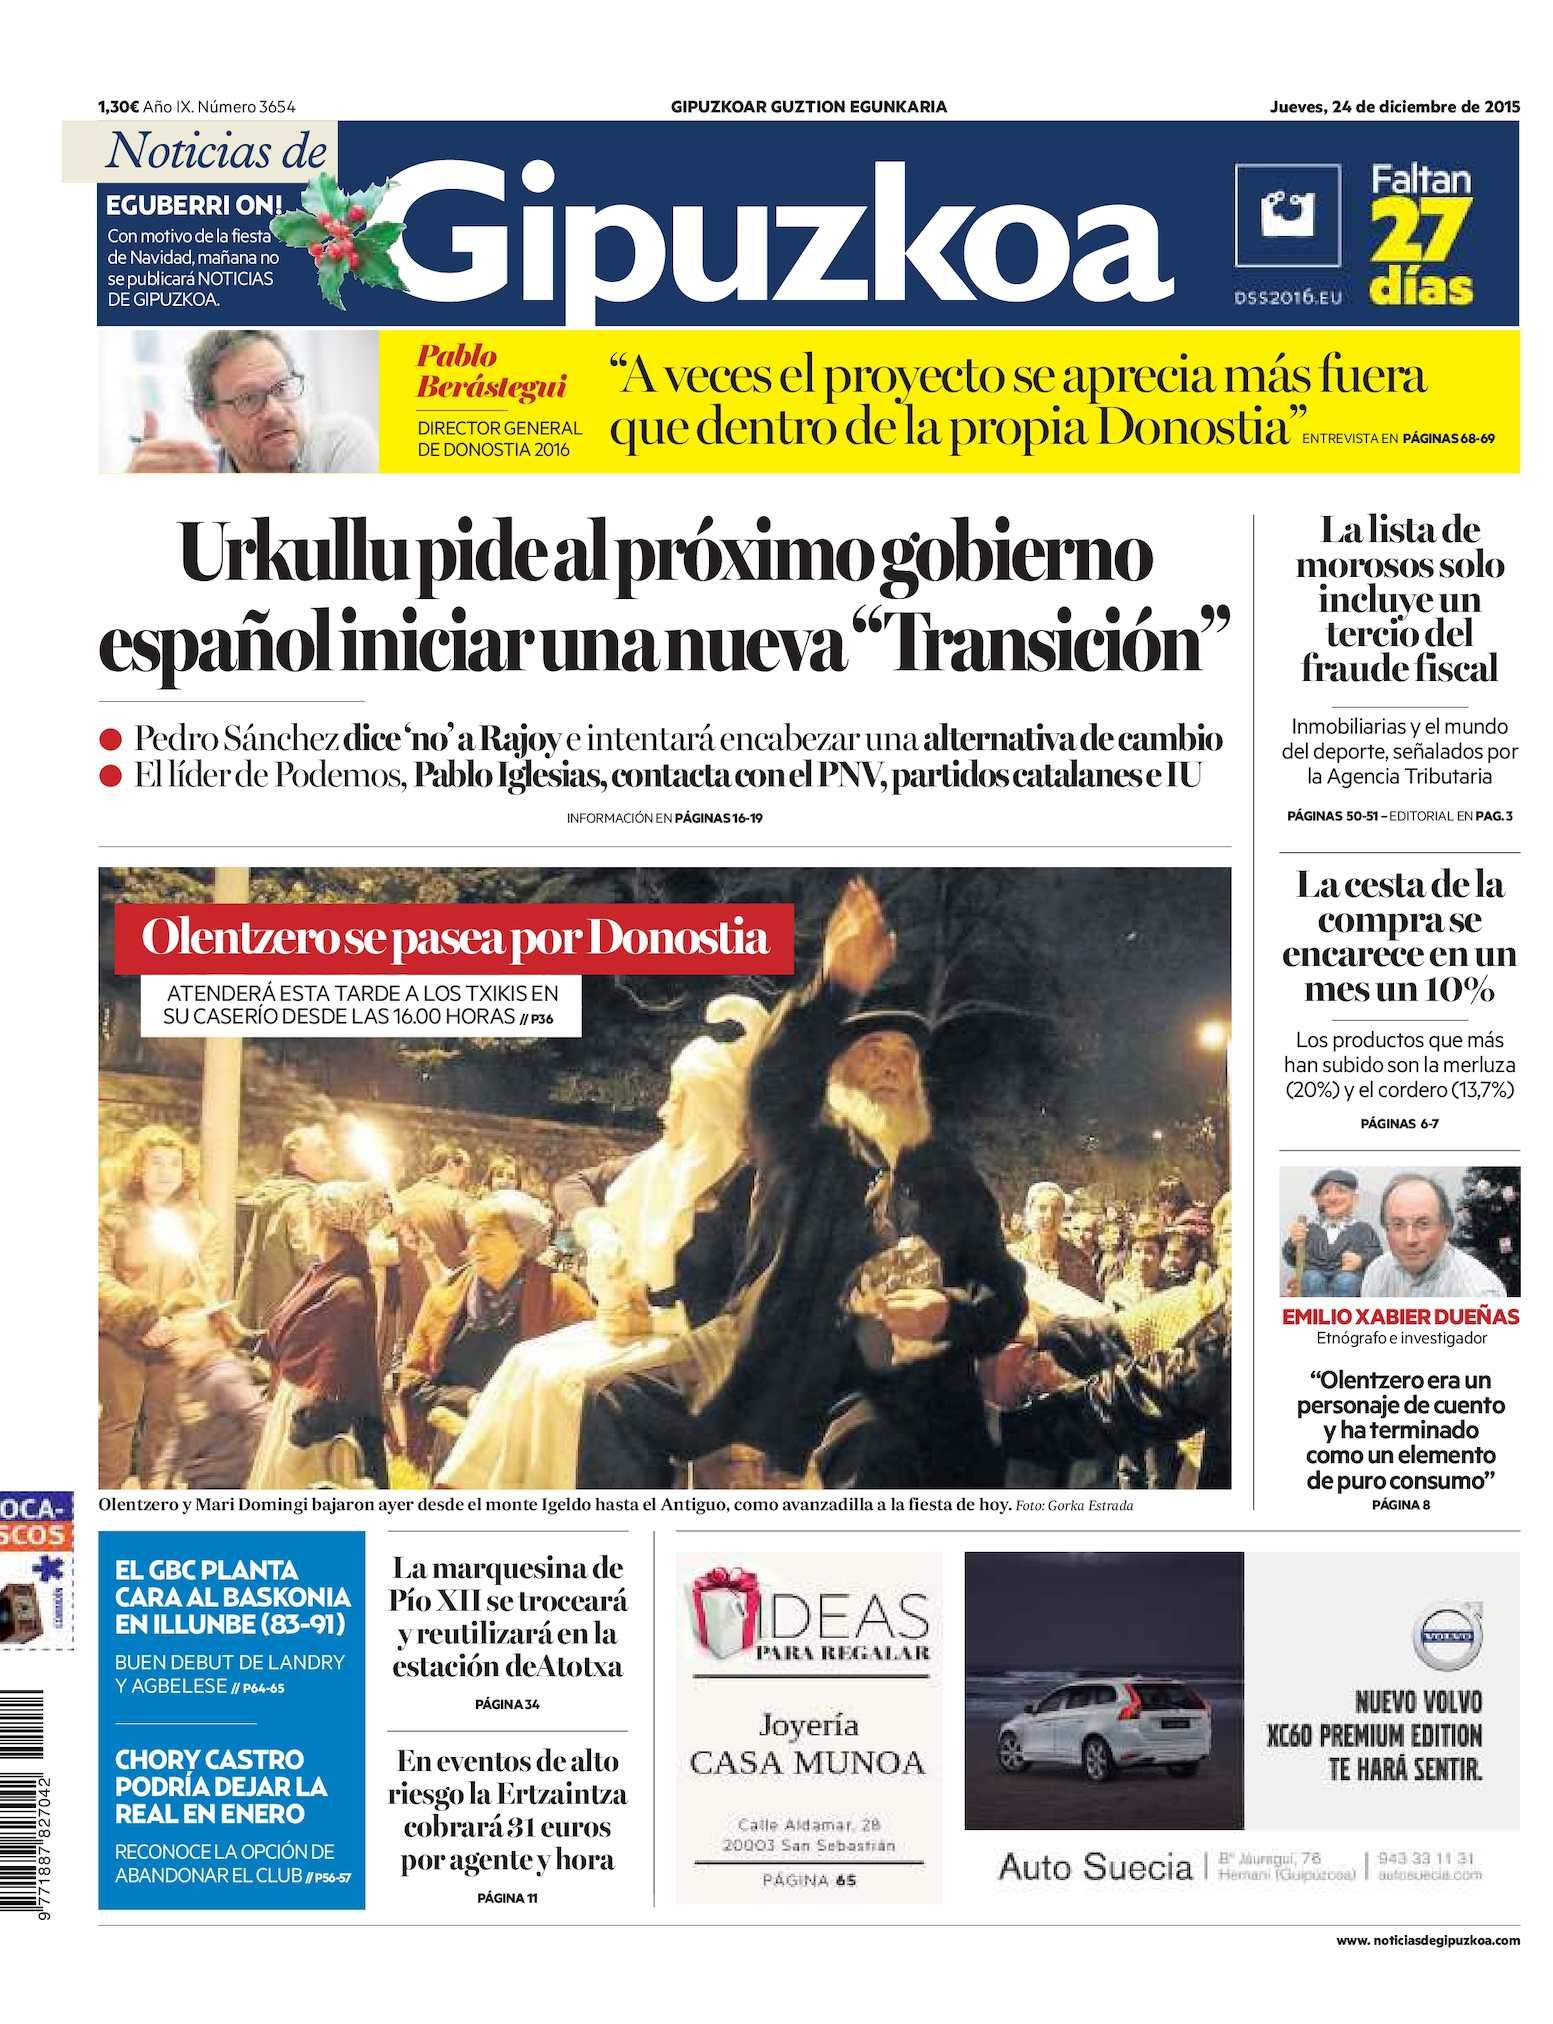 super popular 9655e 30d94 Calaméo - Noticias de Gipuzkoa 20151224